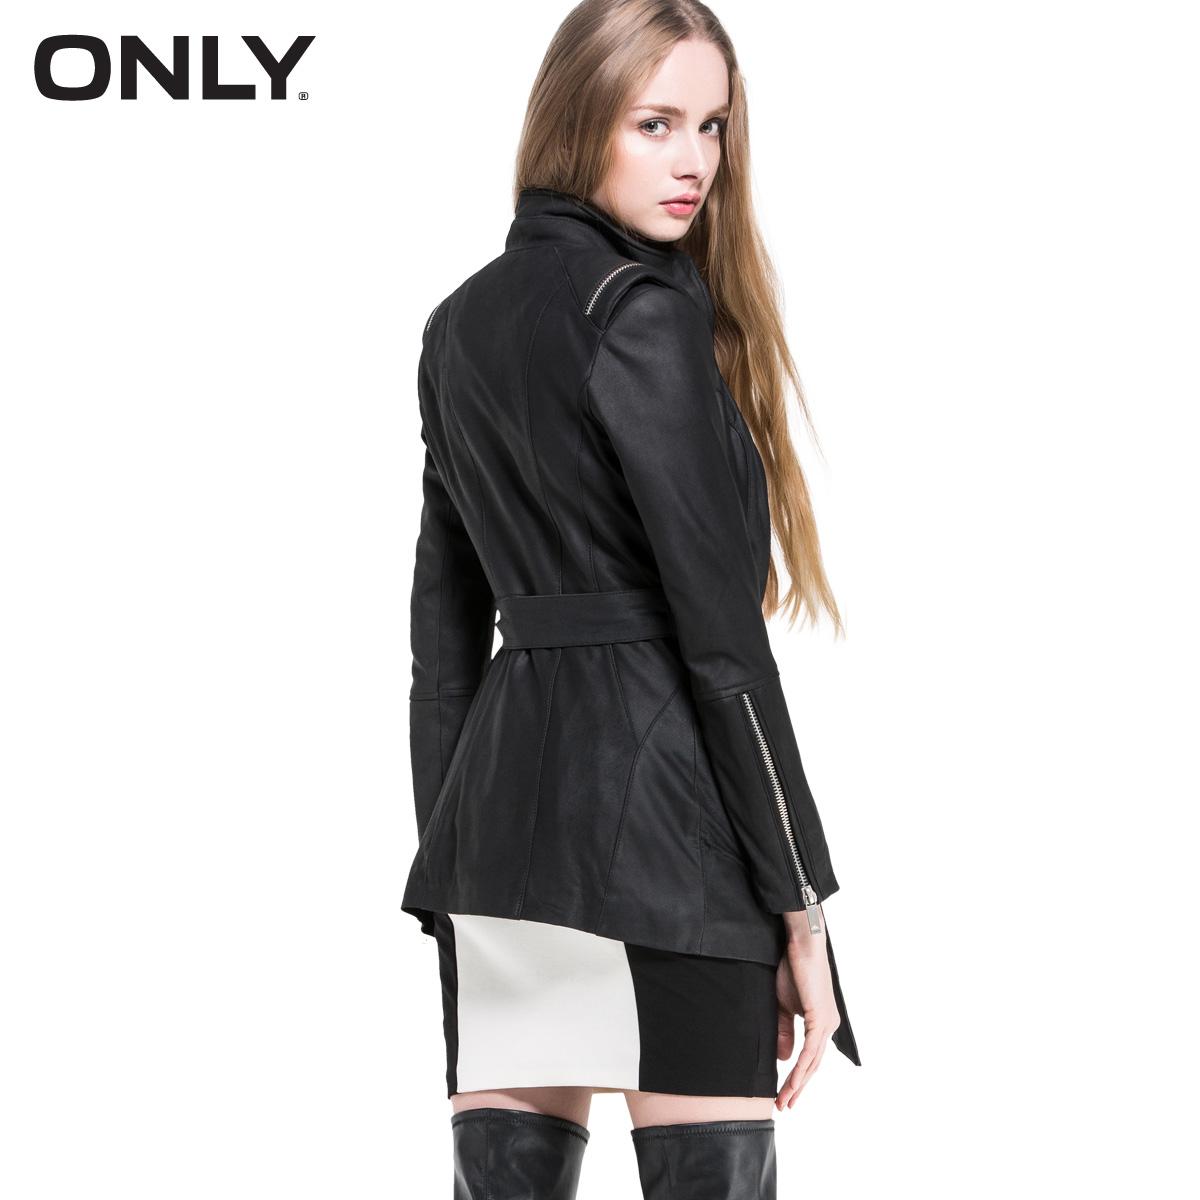 Кожаная куртка ONLY 115110004 ONLY2015